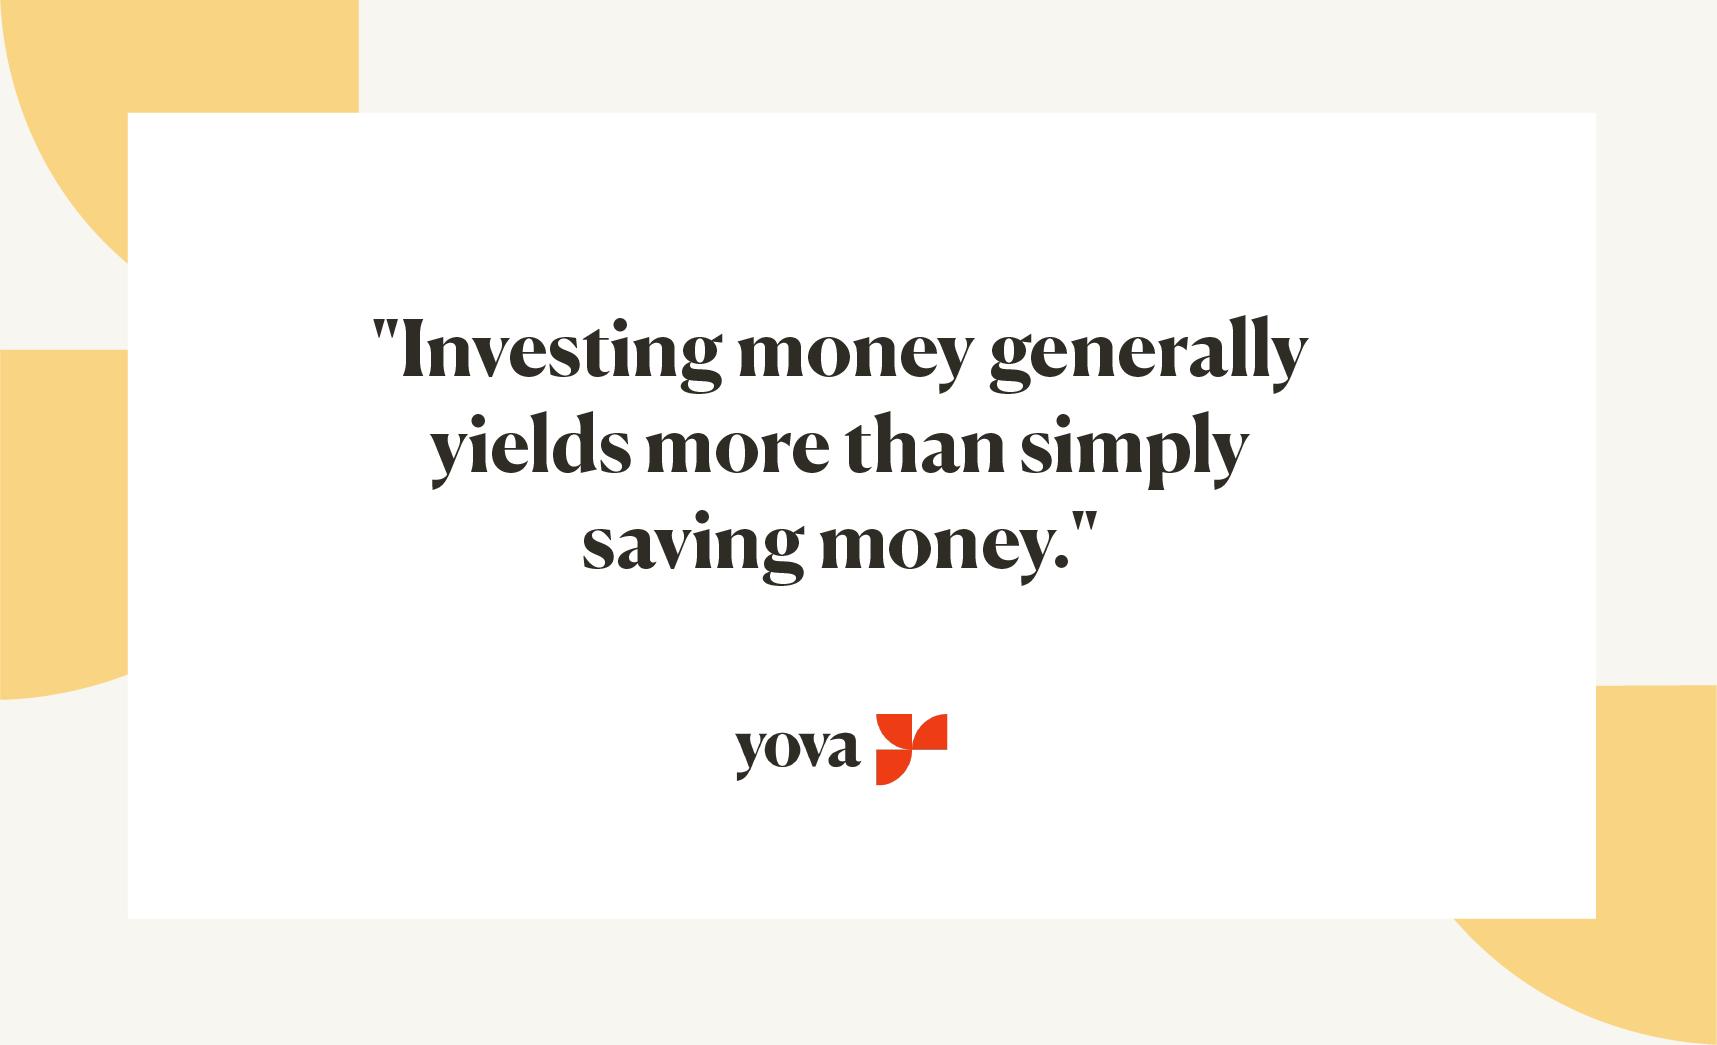 Investing yields more than saving